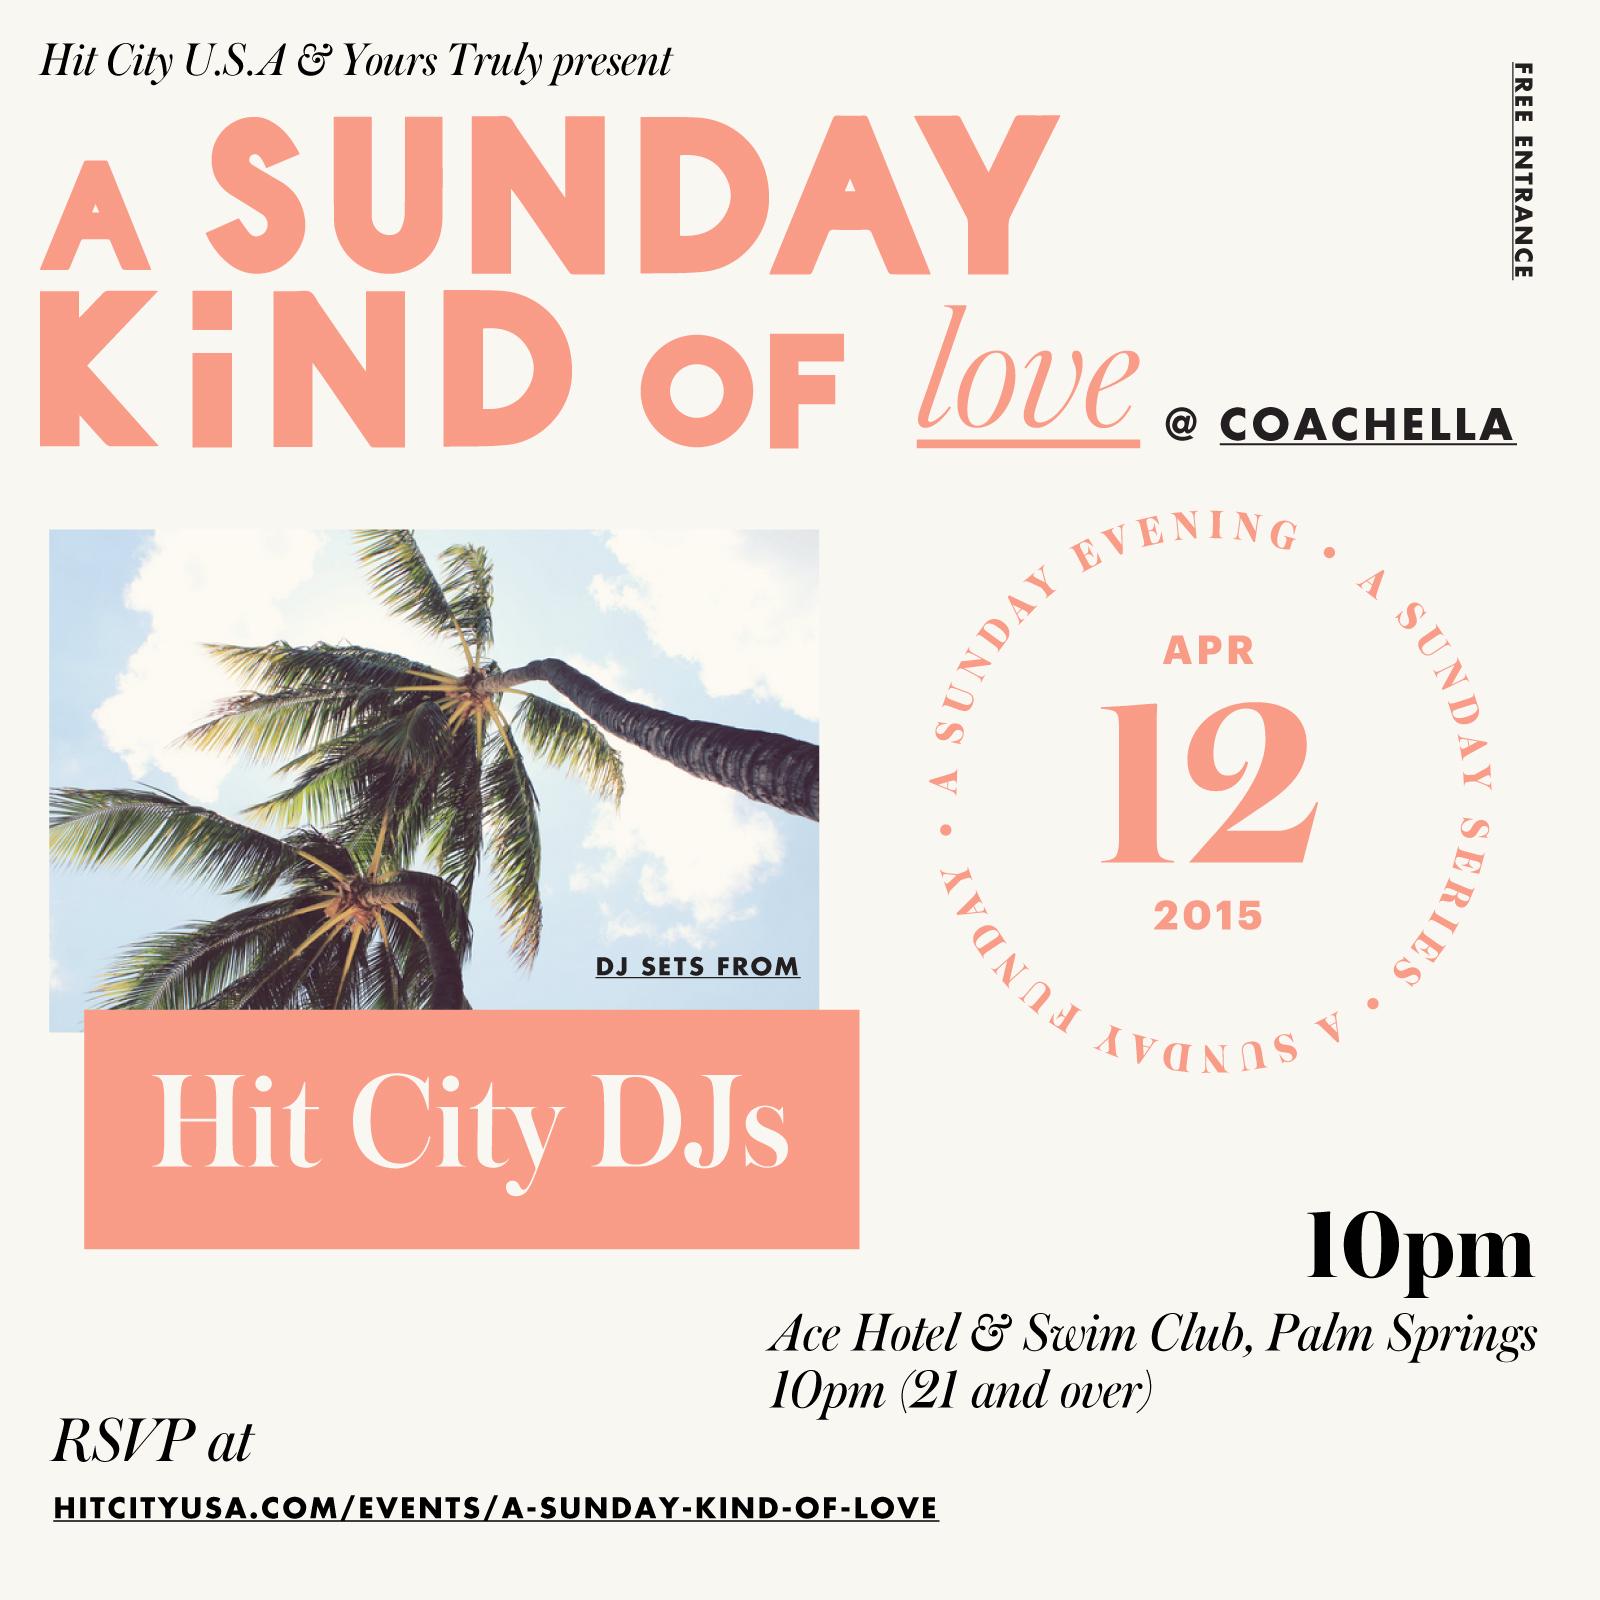 A Sunday Kind of Love @ Coachella Weekend 1